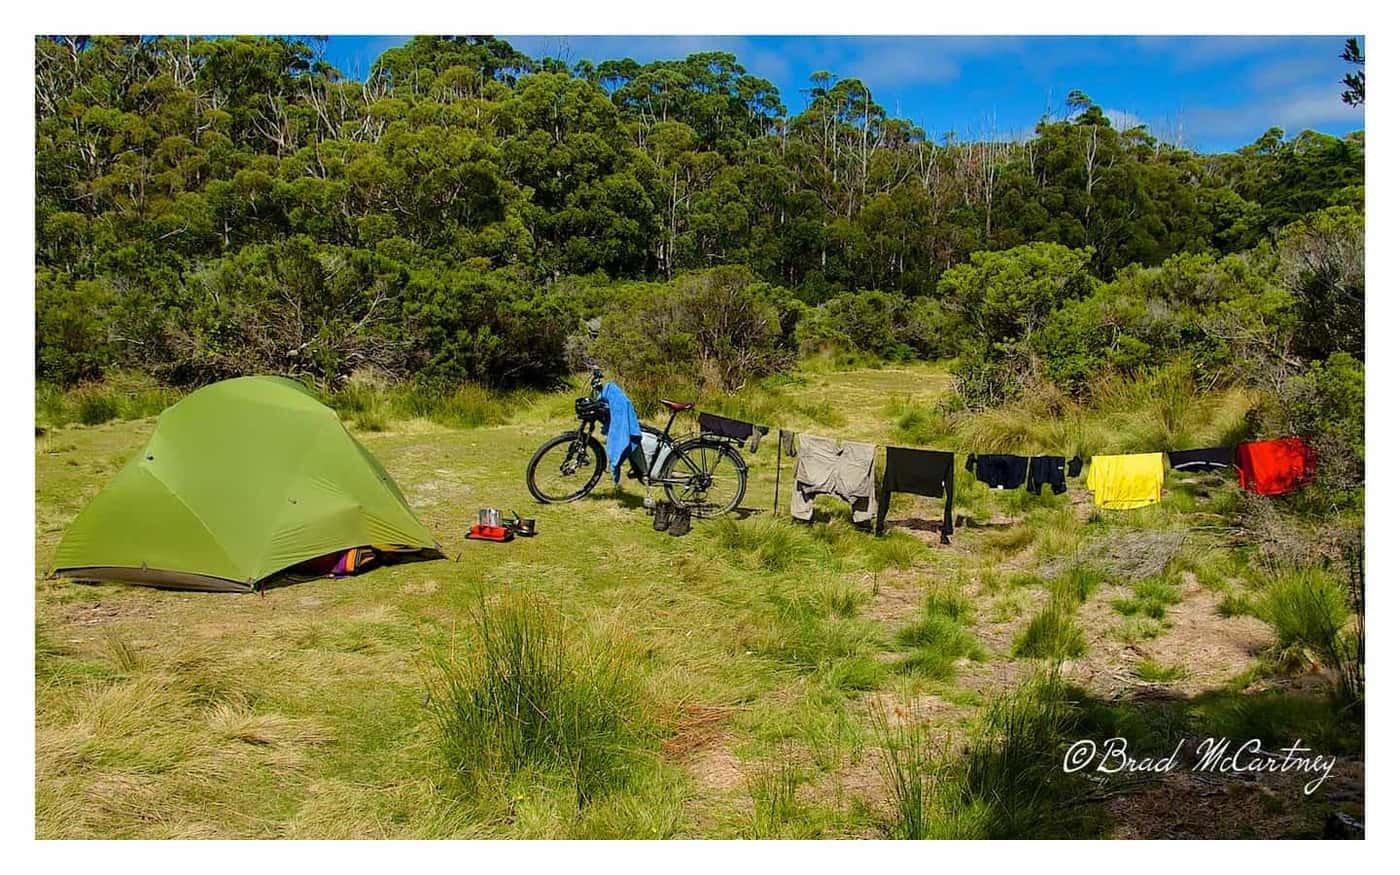 Campsite at Cockle Creek